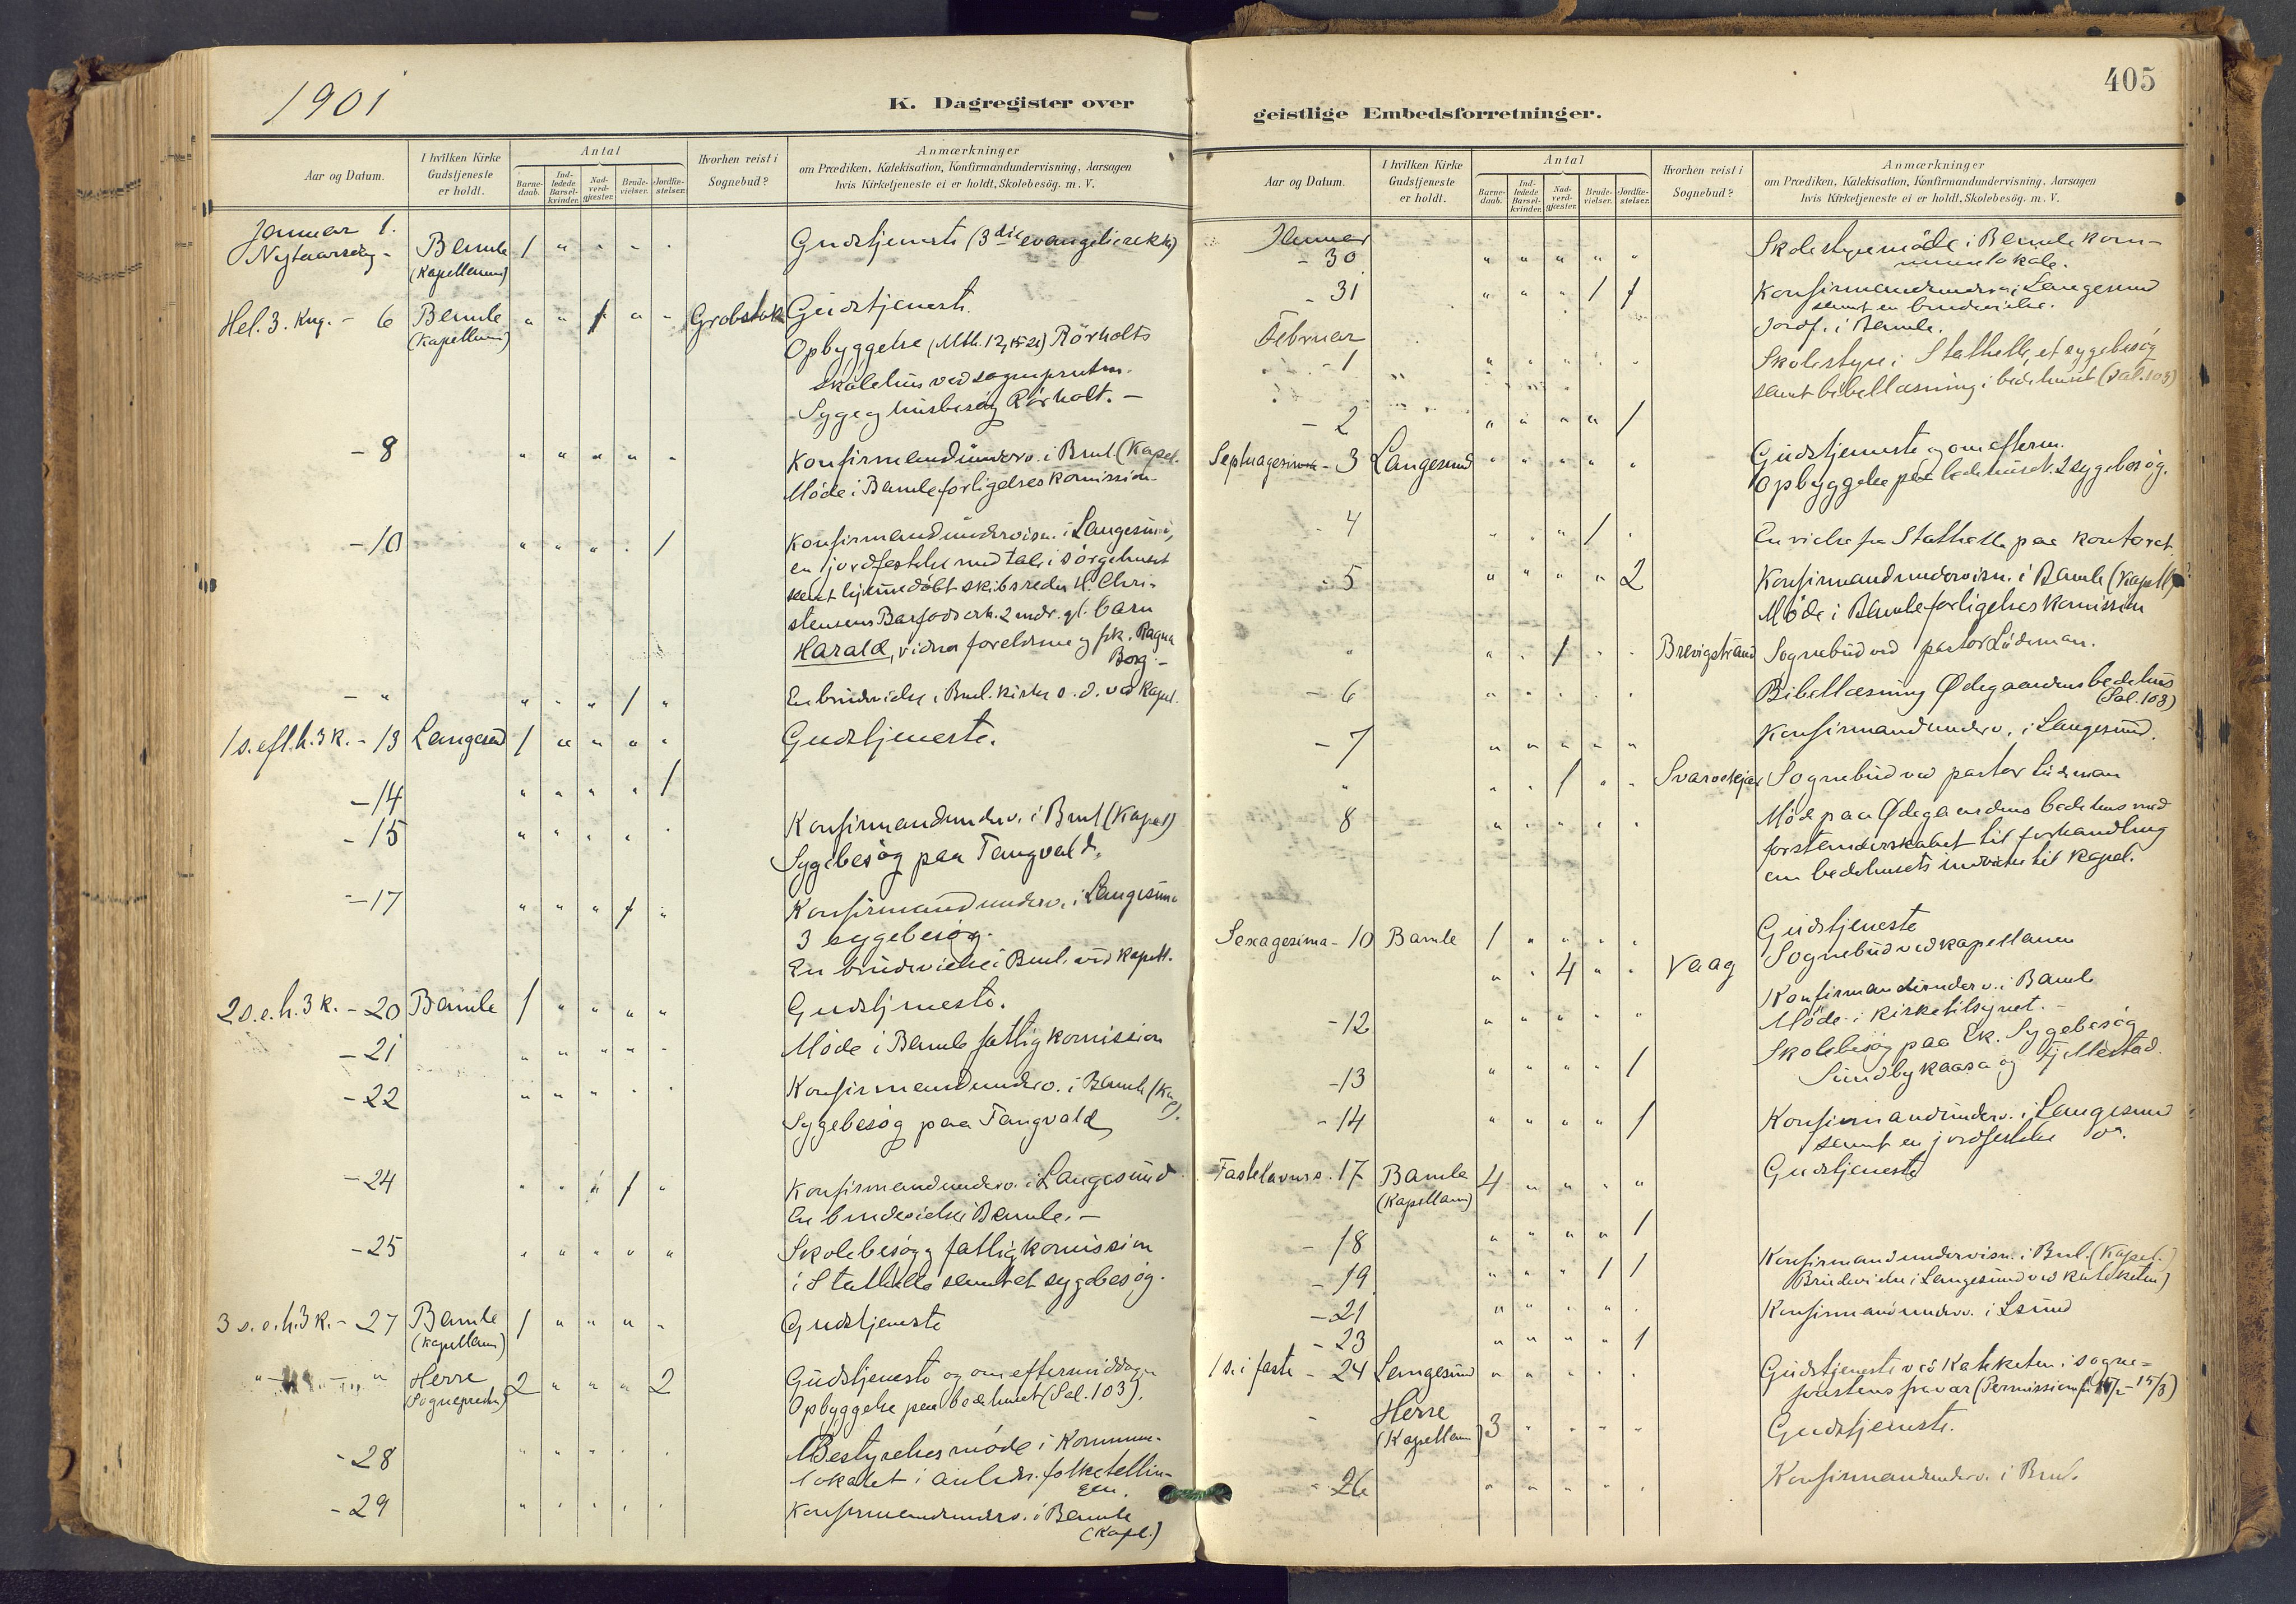 SAKO, Bamble kirkebøker, F/Fa/L0009: Ministerialbok nr. I 9, 1901-1917, s. 405